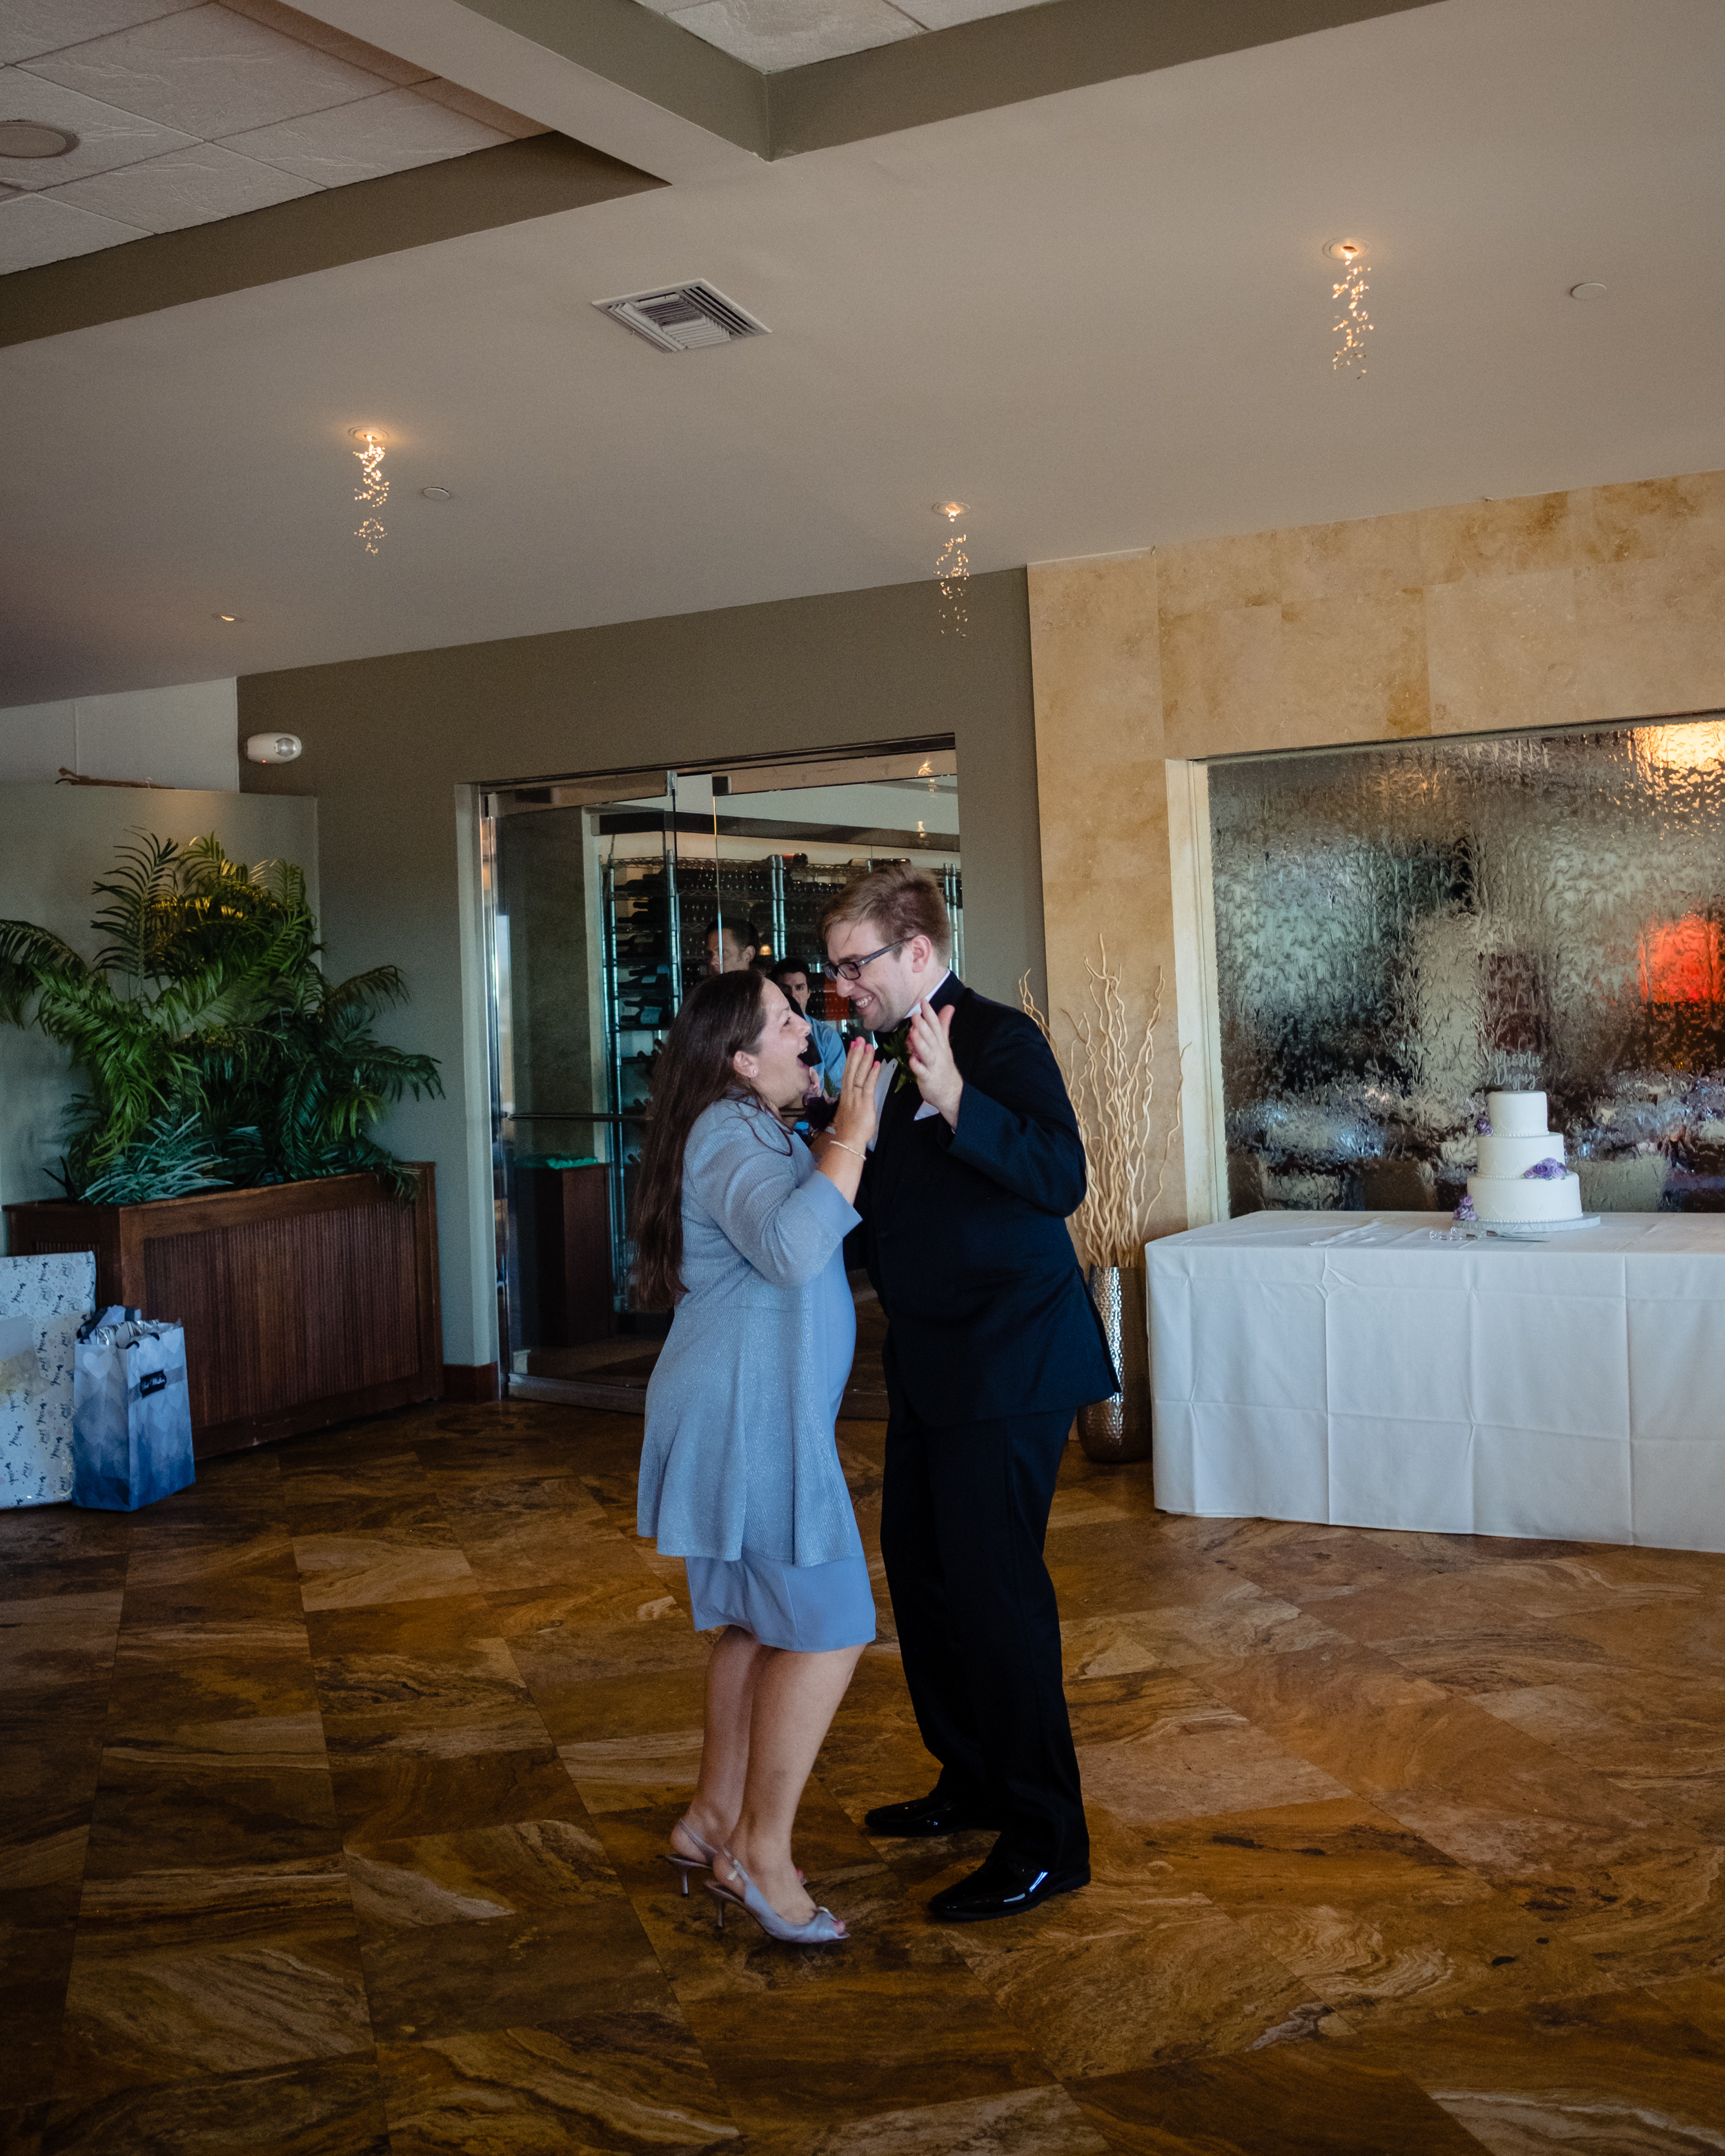 HAH_Zoe and Daniel_Clearwater Wedding_421_2018.jpg